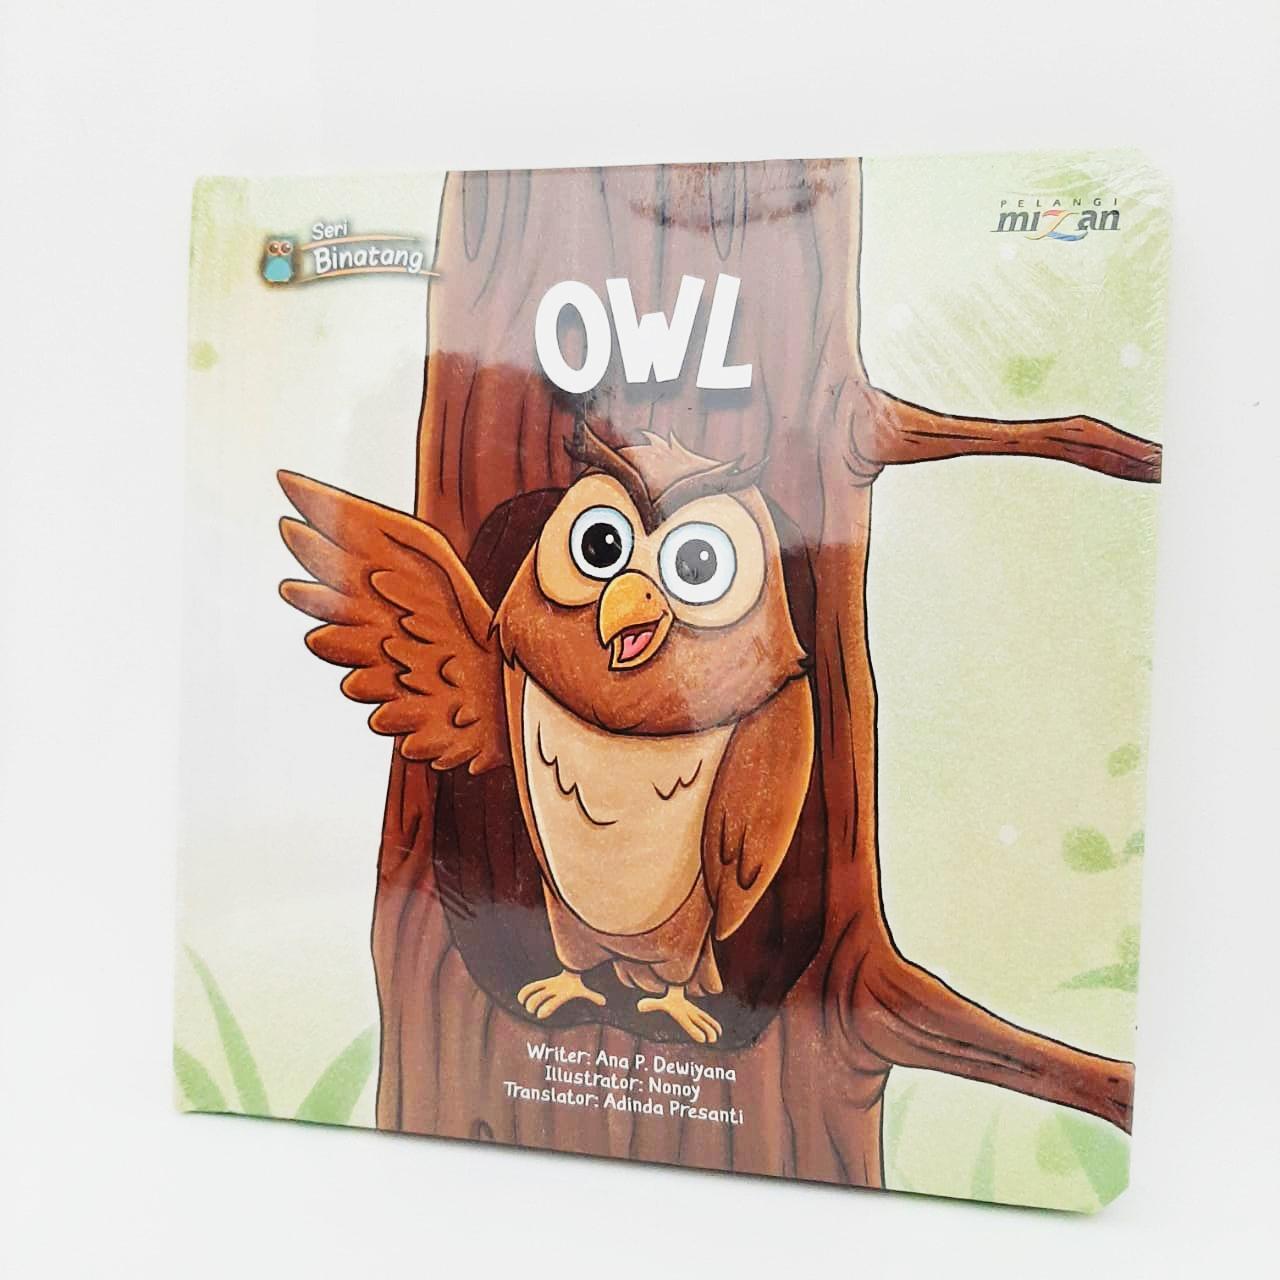 SERI BINATANG: OWL ENGLISH VERSION (BOARDBOOK)